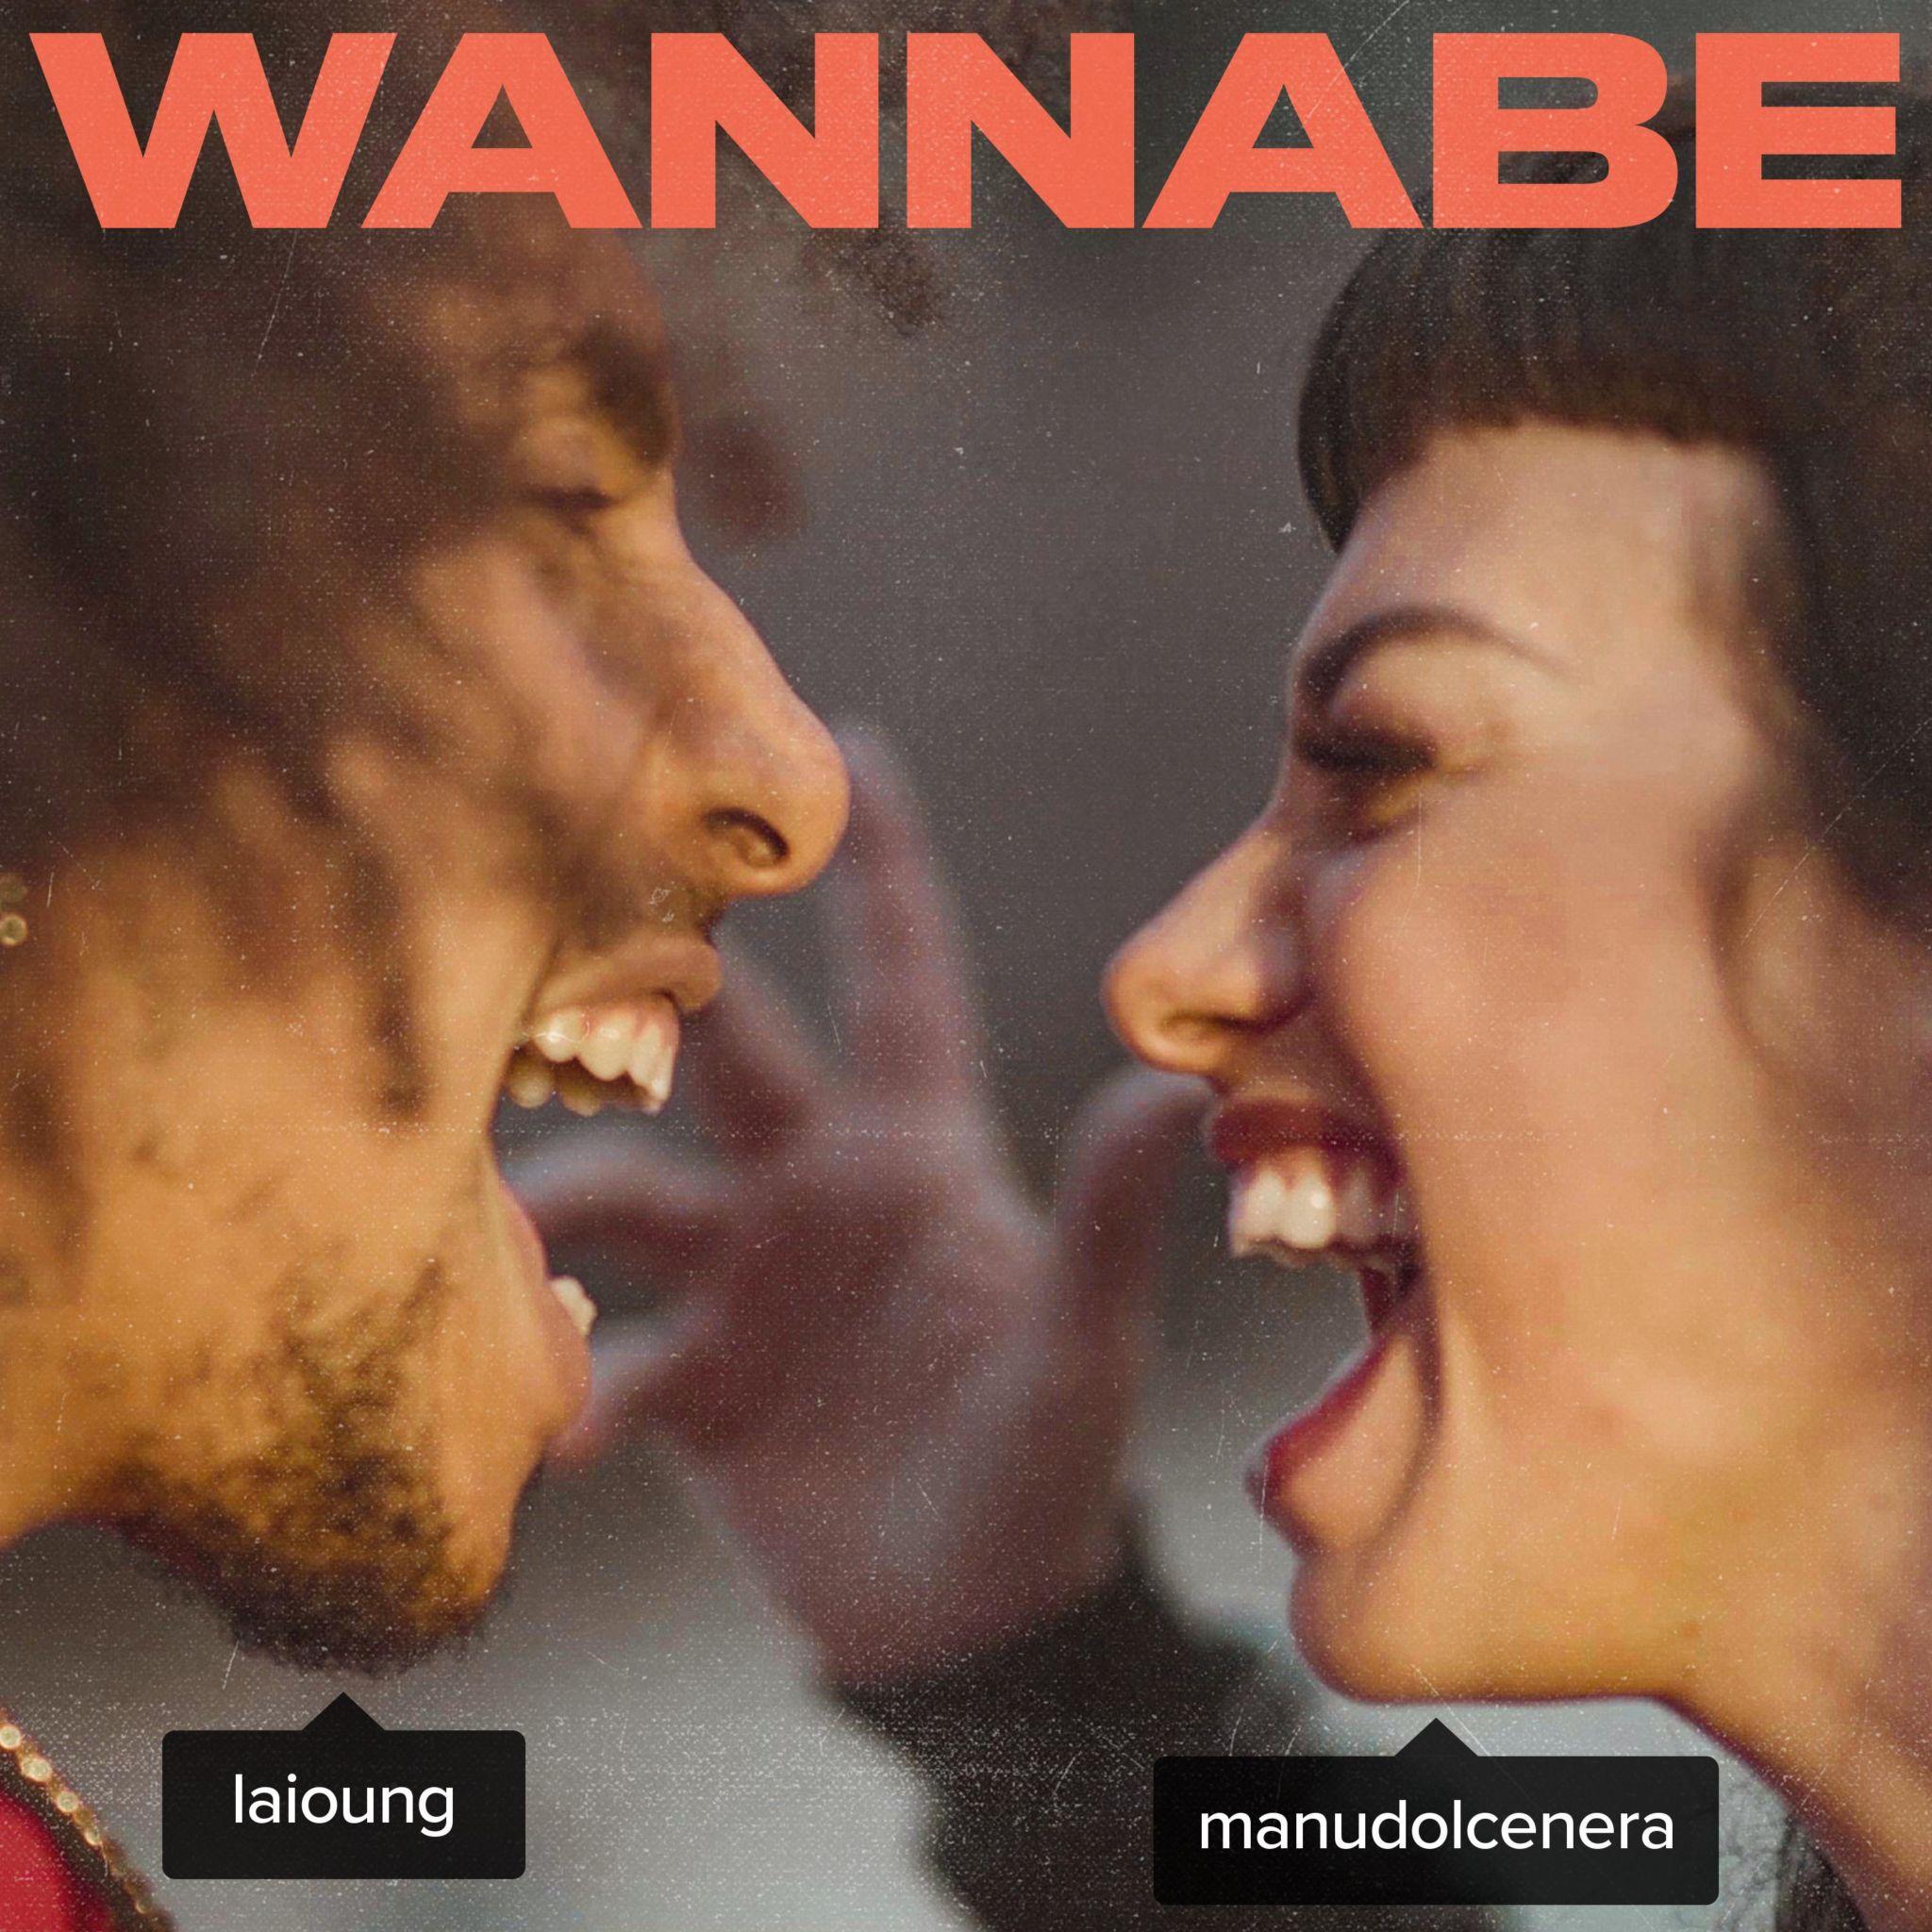 Radio Web Italia: Wannabe – Dolcenera Feat. Laioung il nuovo singolo